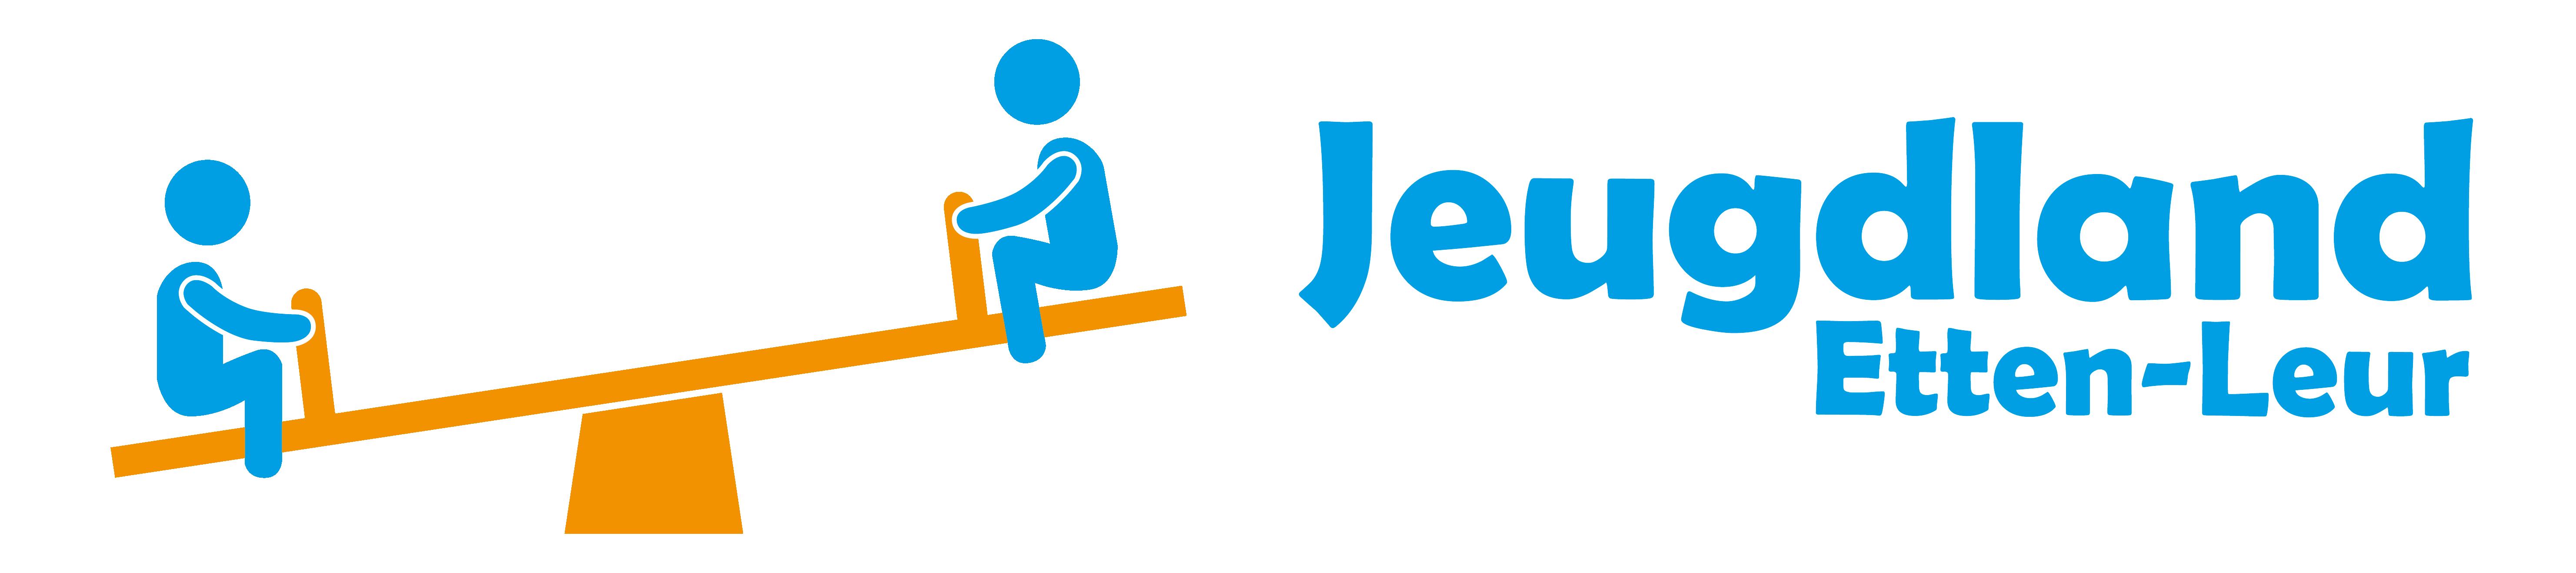 Jeugdland Etten-Leur